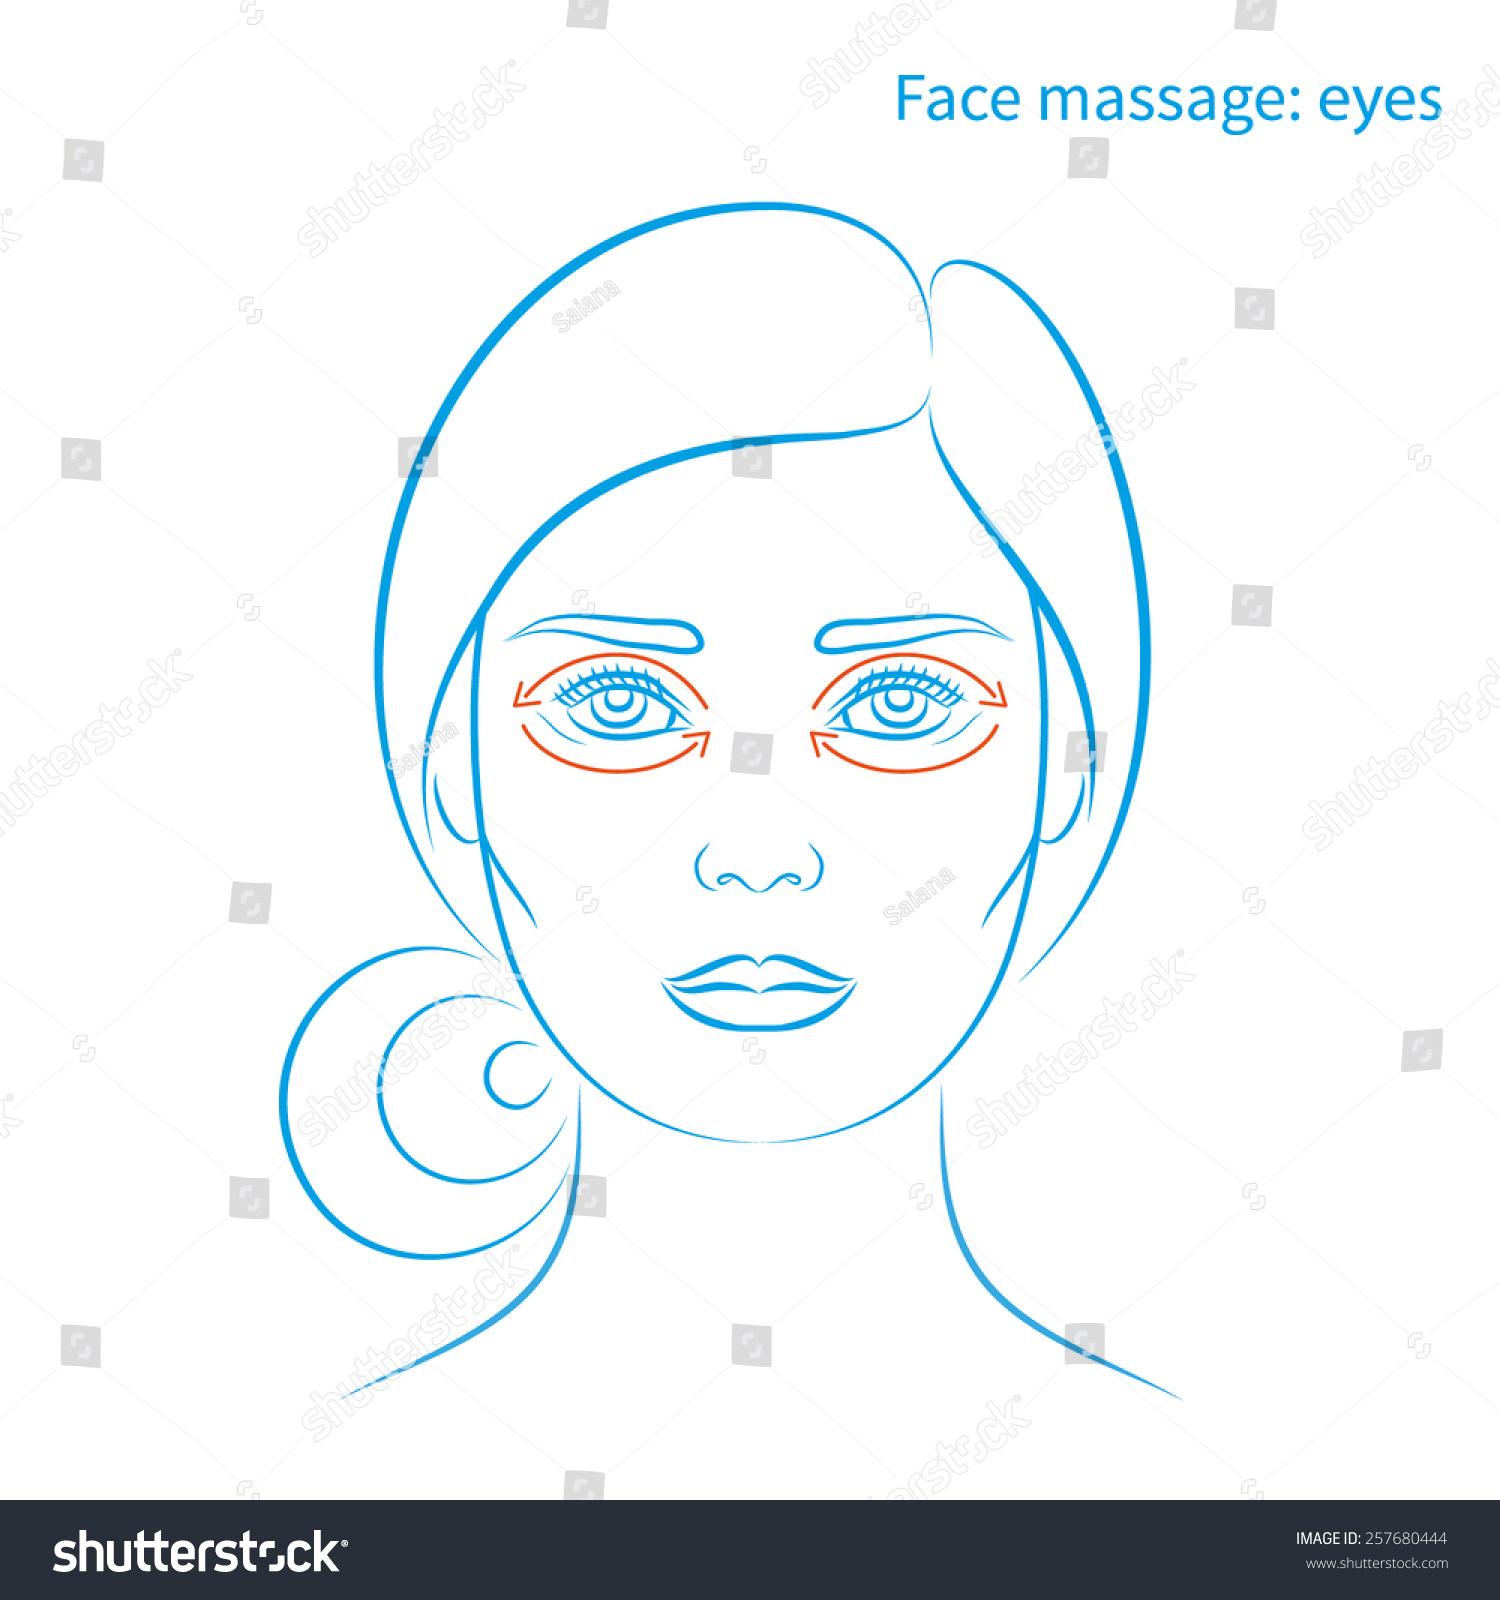 Vector Illustration Face Massage Instruction Eyes Stock-Vektorgrafik ...